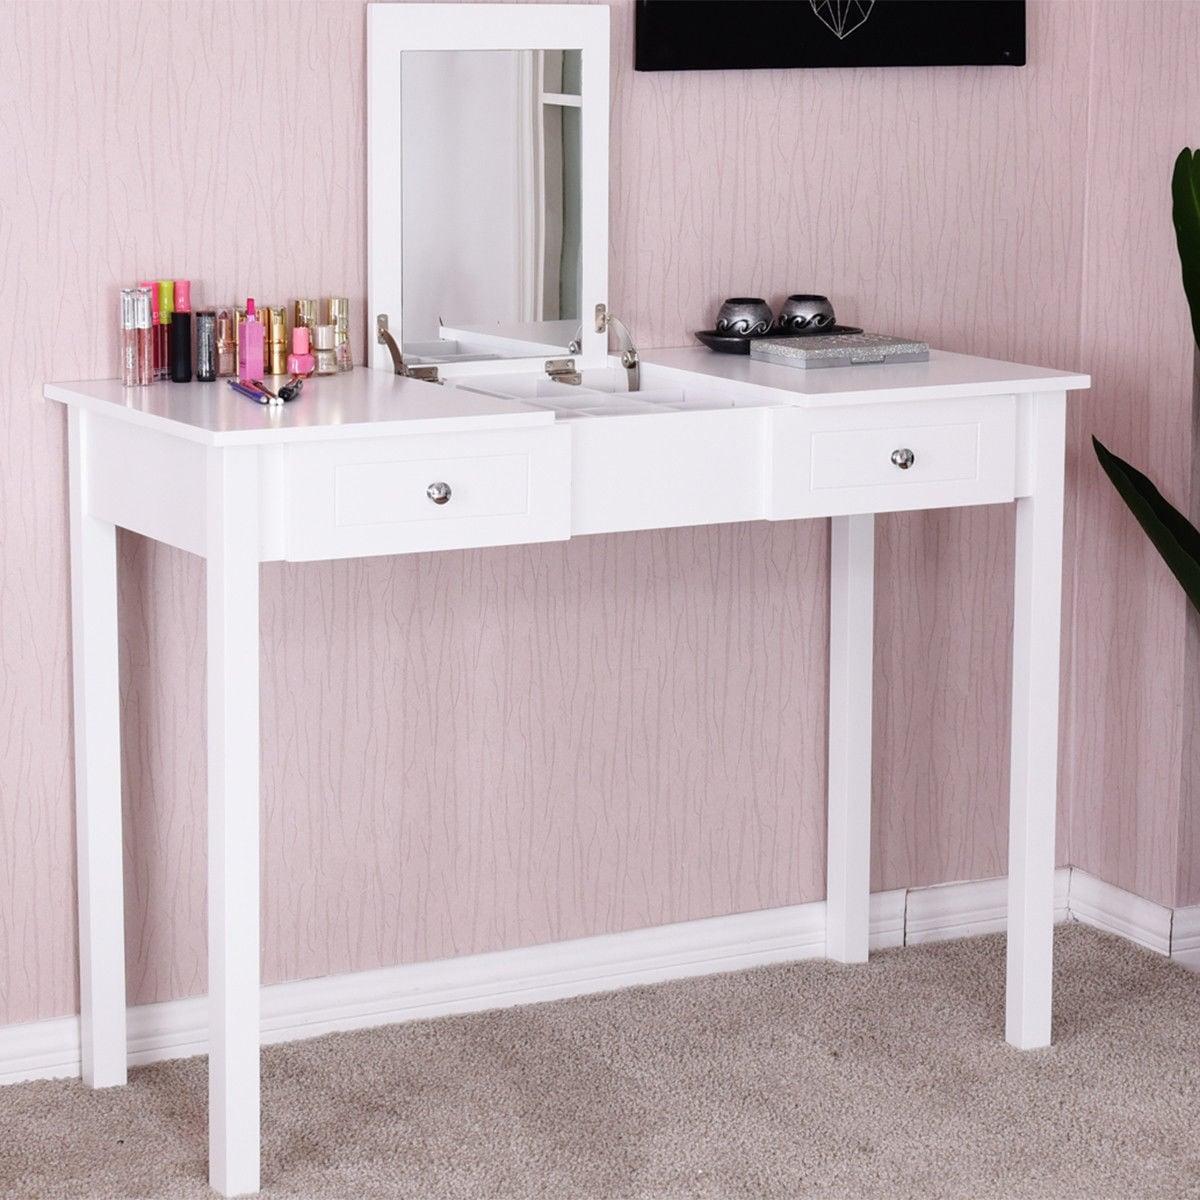 White Vanity Desk With Mirror.Costway Vanity Table Dressing Table Flip Top Desk Mirror 2 Drawers Furniture White